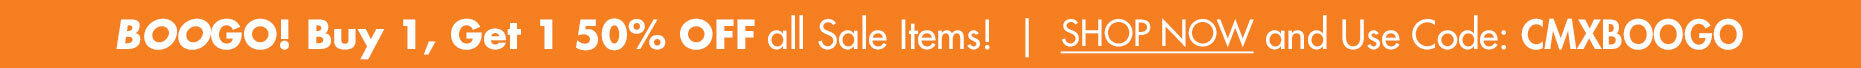 BOOGO! Buy one, get one 50% OFF all Orange Ticket Sale Items